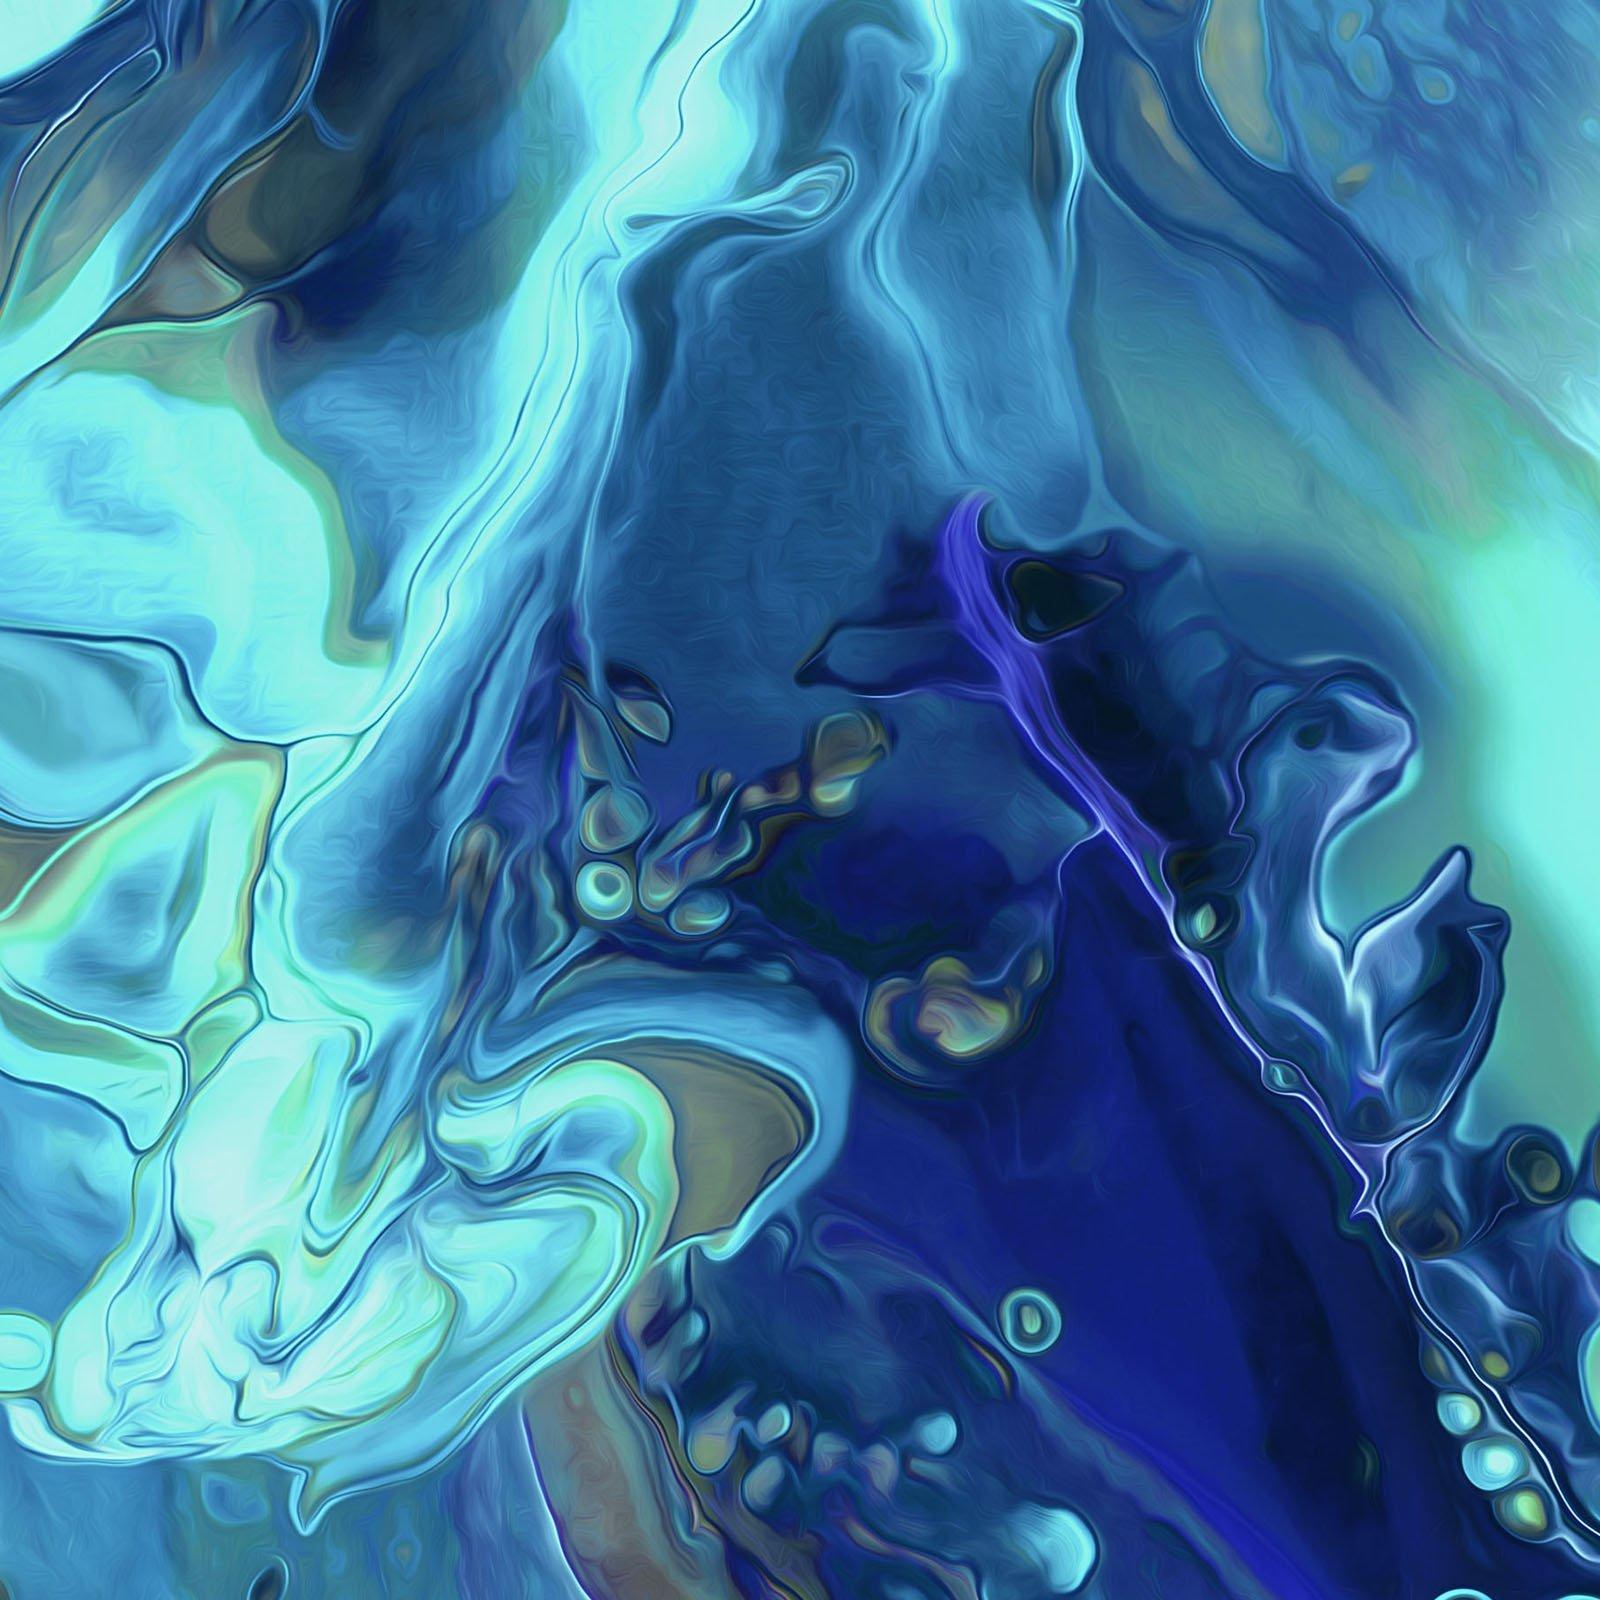 FLU2-4310 BT - FLUIDITY 2 BY PDR LLC WAVES BLUE/TEAL